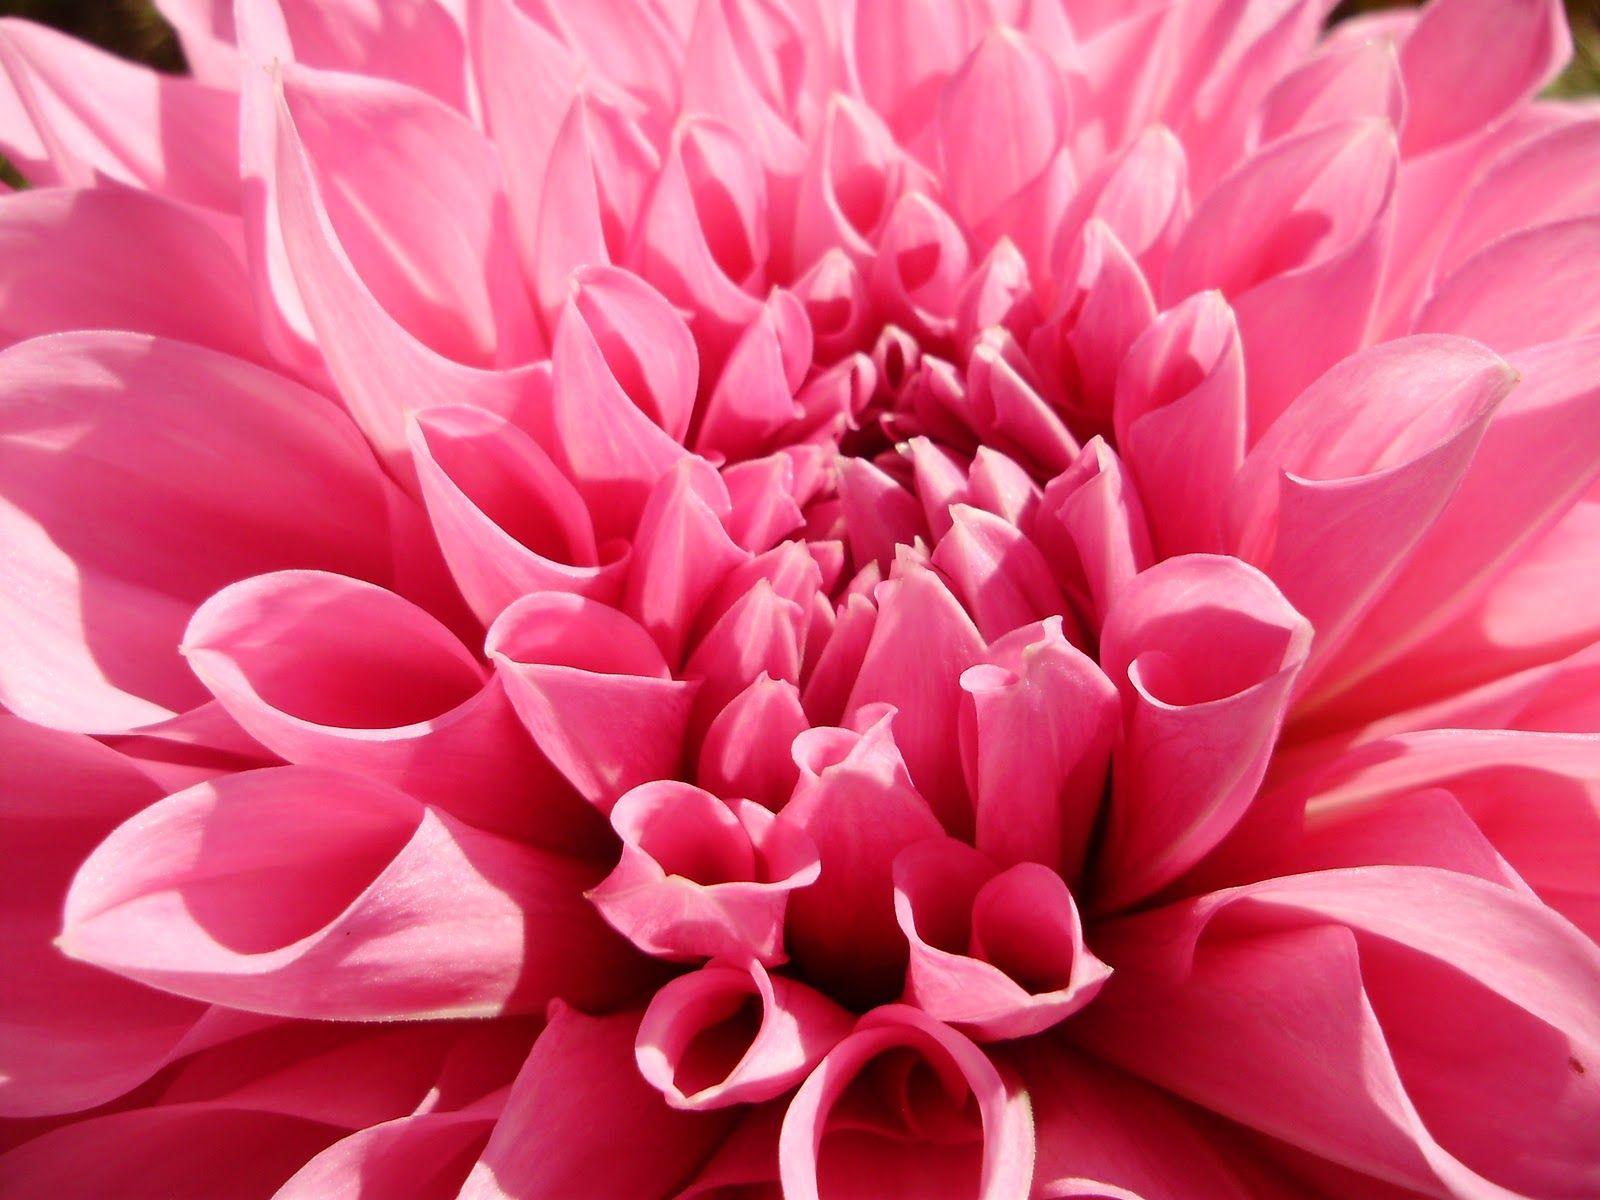 Spring Flowers Background Pink DahliaSpring Flower